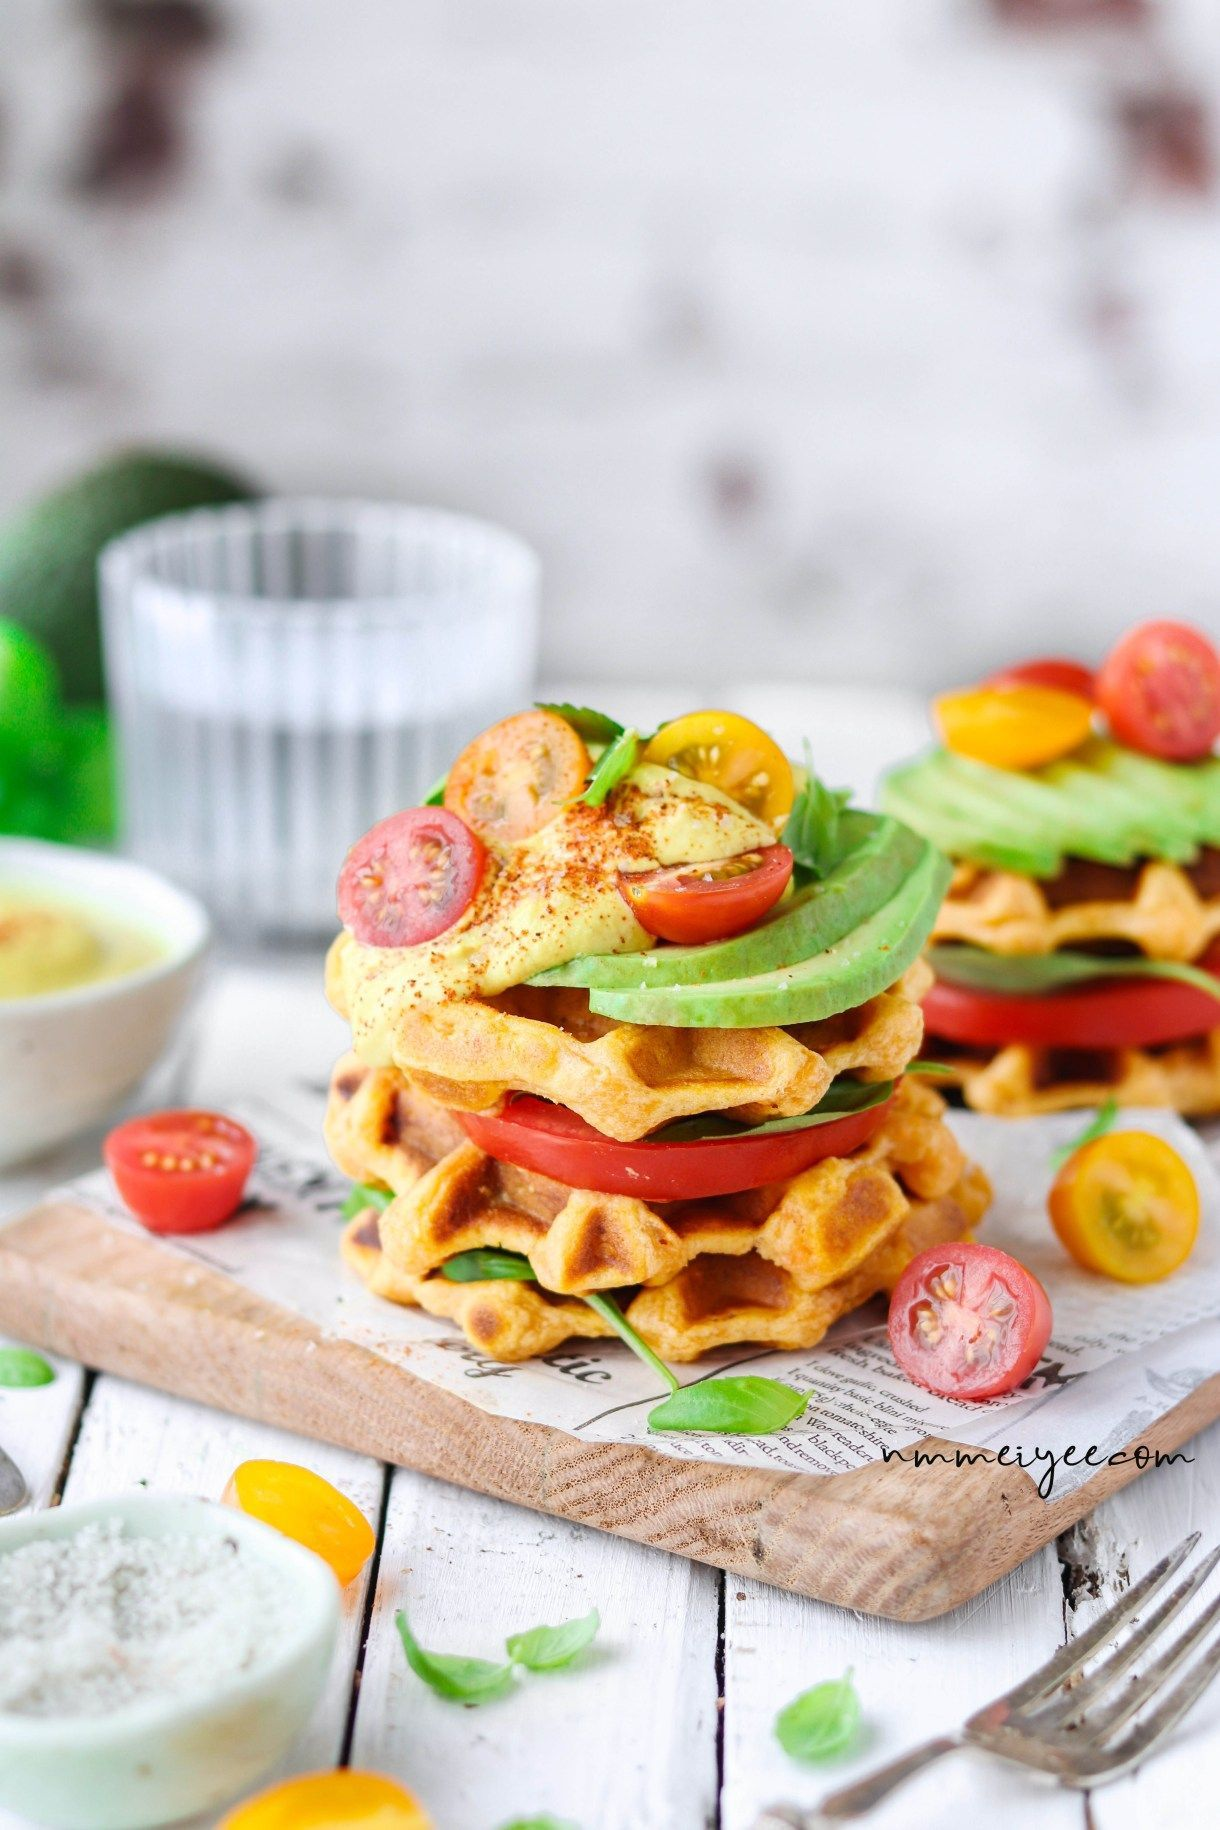 Sweet potato waffles with vegan hollandaise sauce | nm_meiyee #hollandaisesauce Sweet potato waffles with vegan hollandaise sauce | nm_meiyee #hollandaisesauce